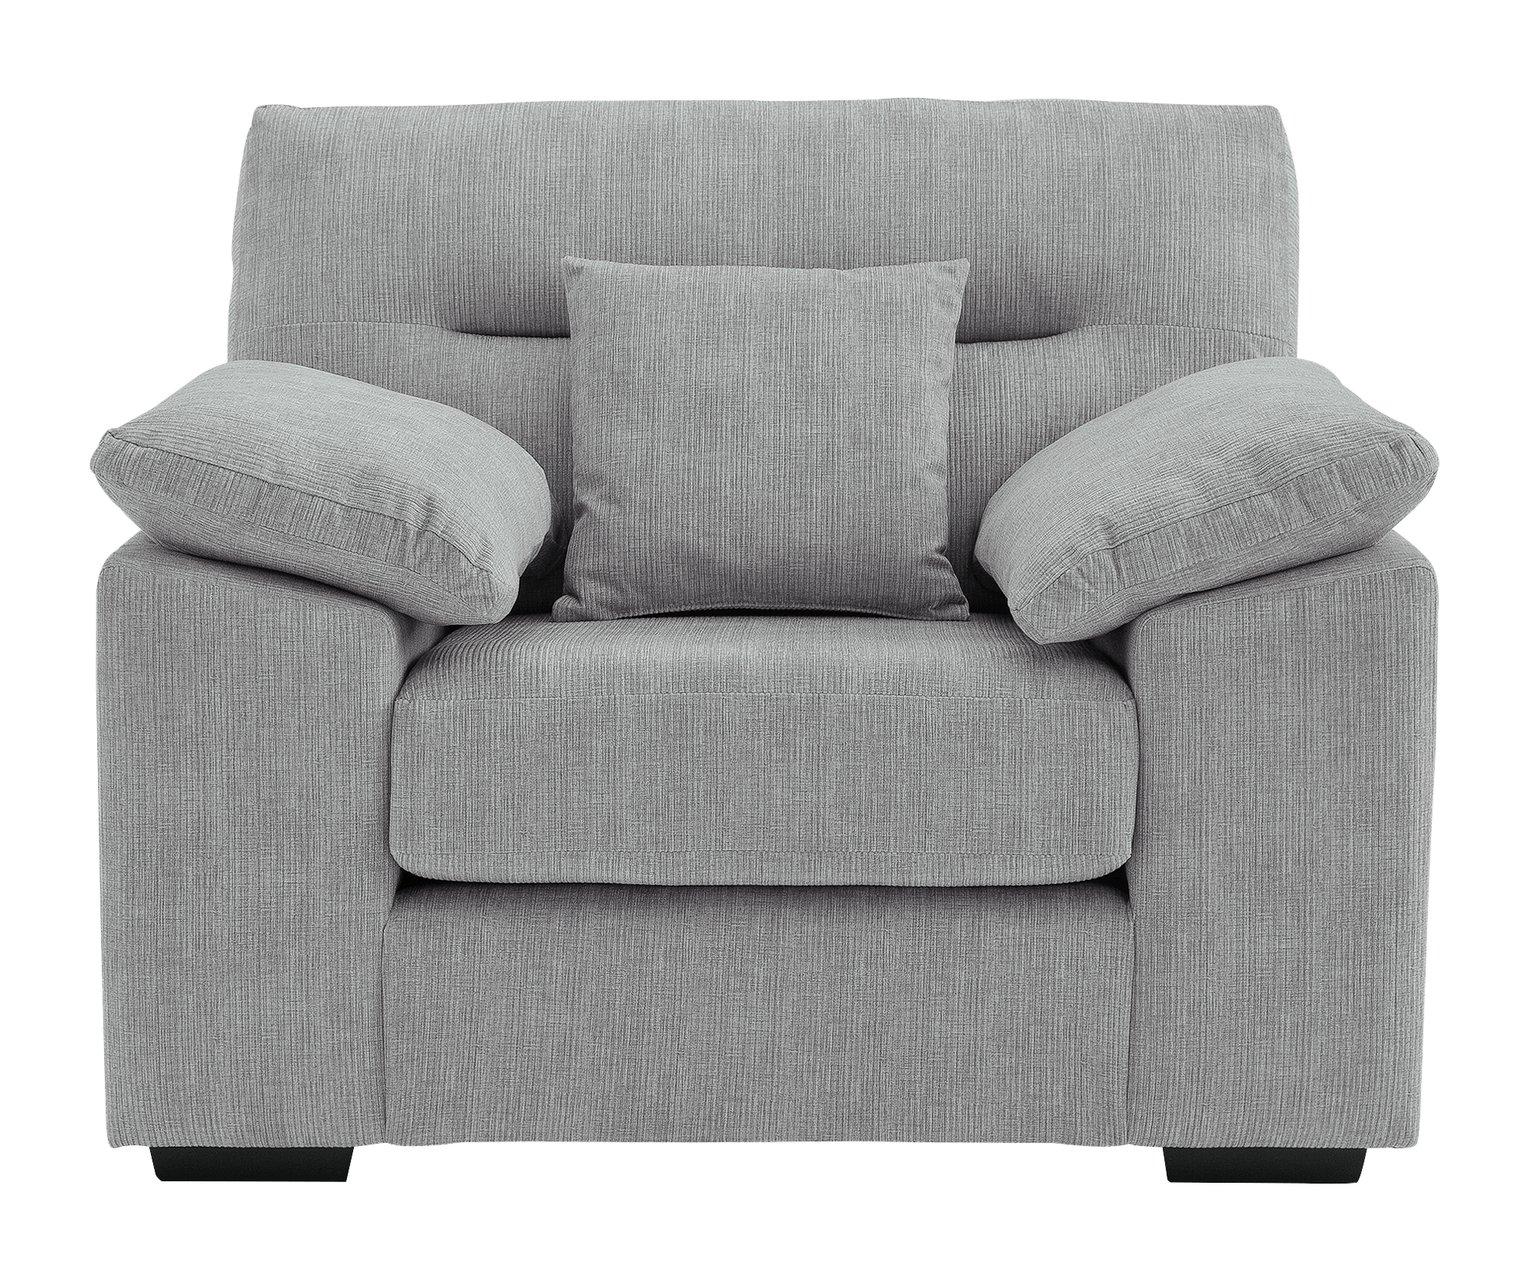 Argos Home Donavan Fabric Armchair - Silver